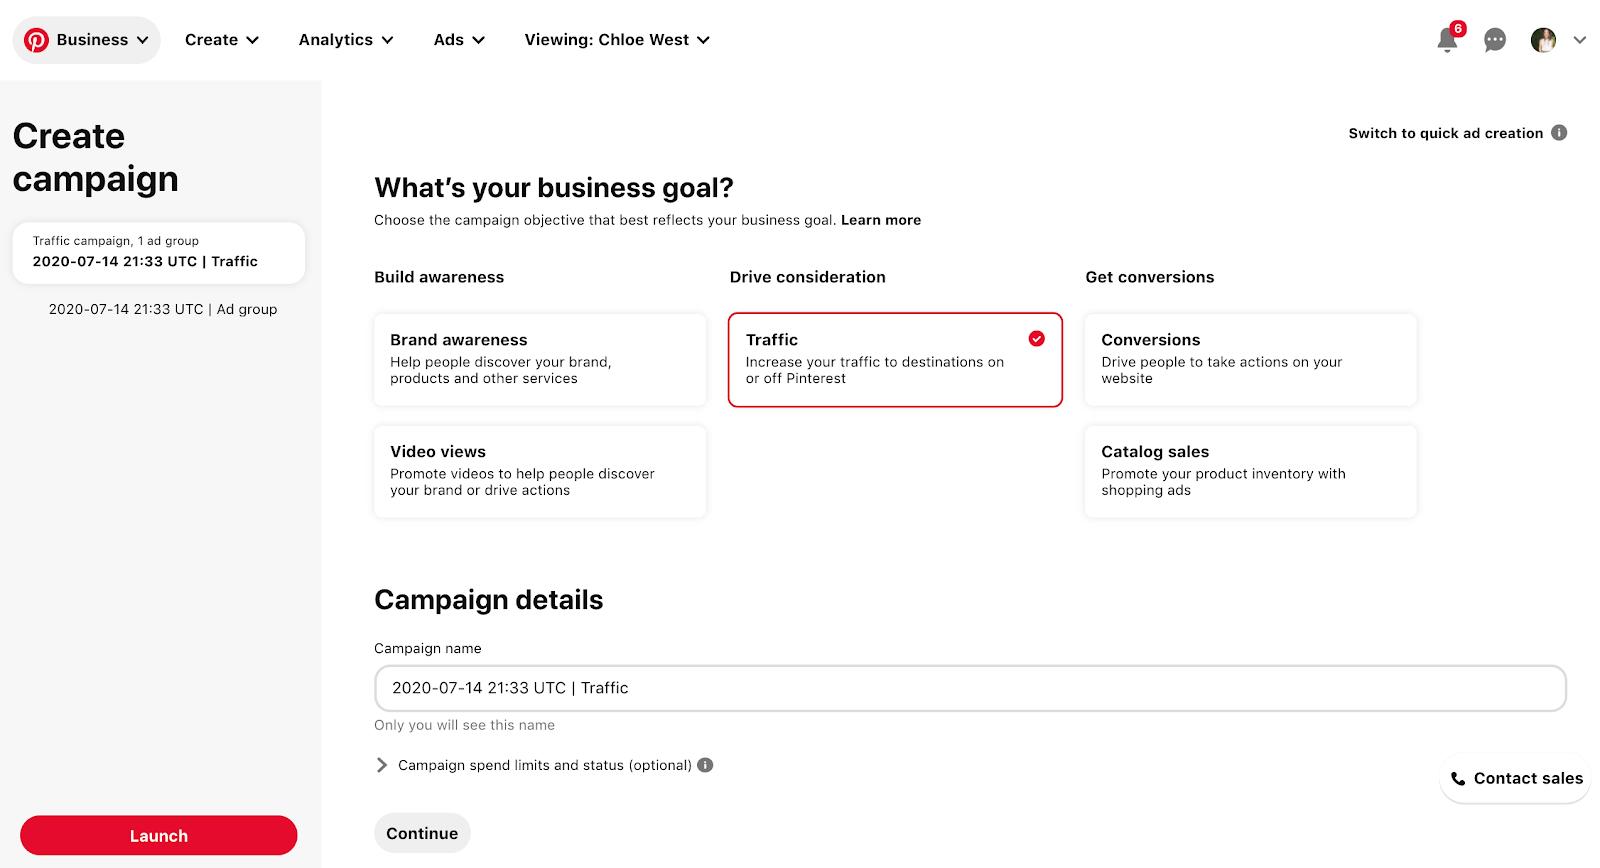 Guía de como publicitar tu contenido en Pinterest